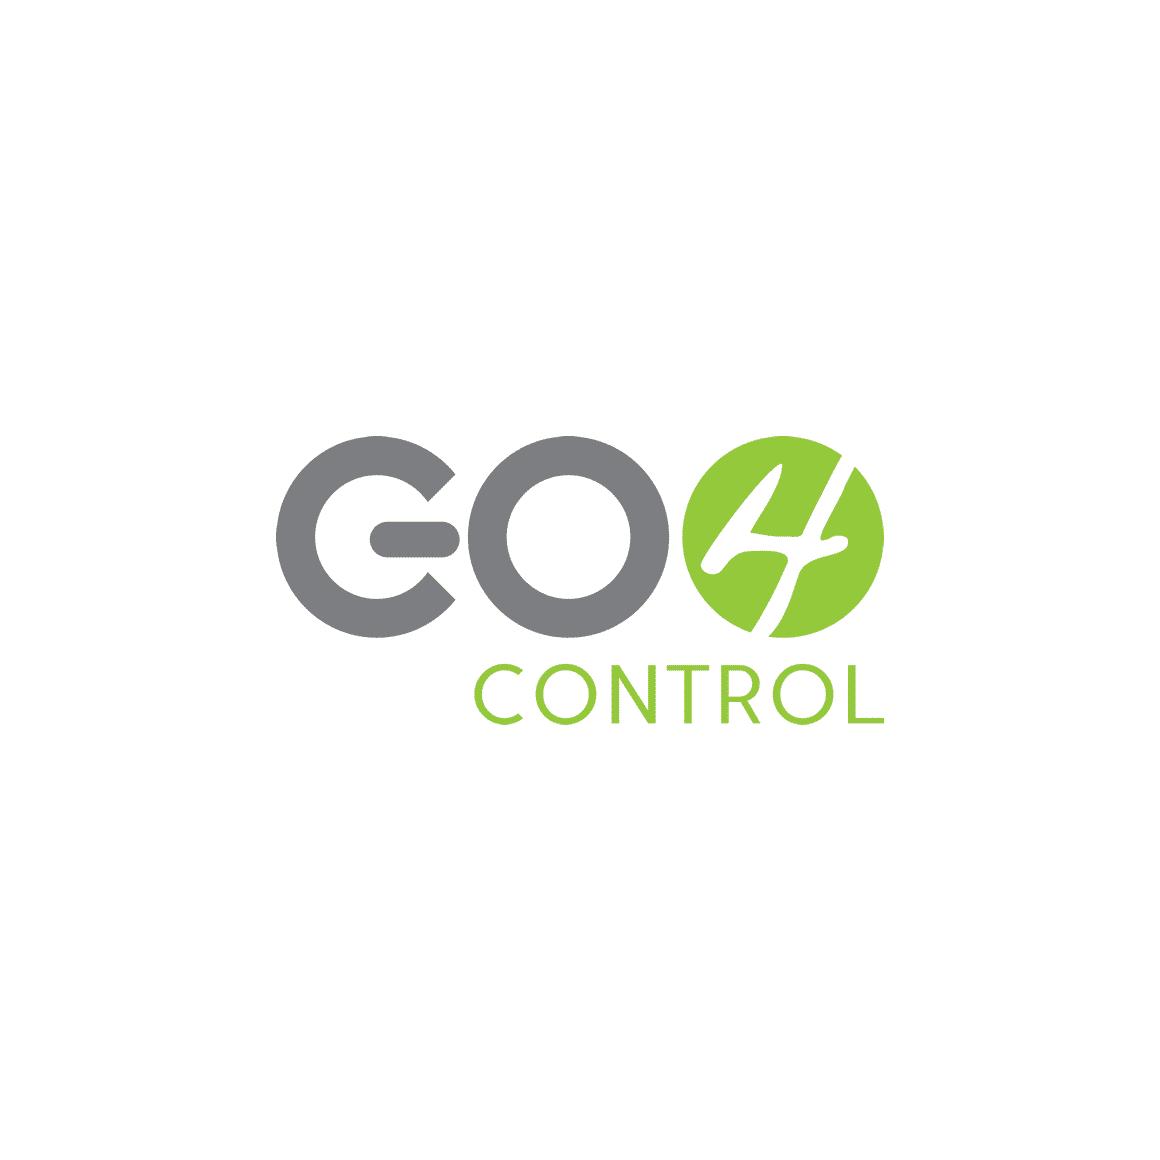 Go 4 Control